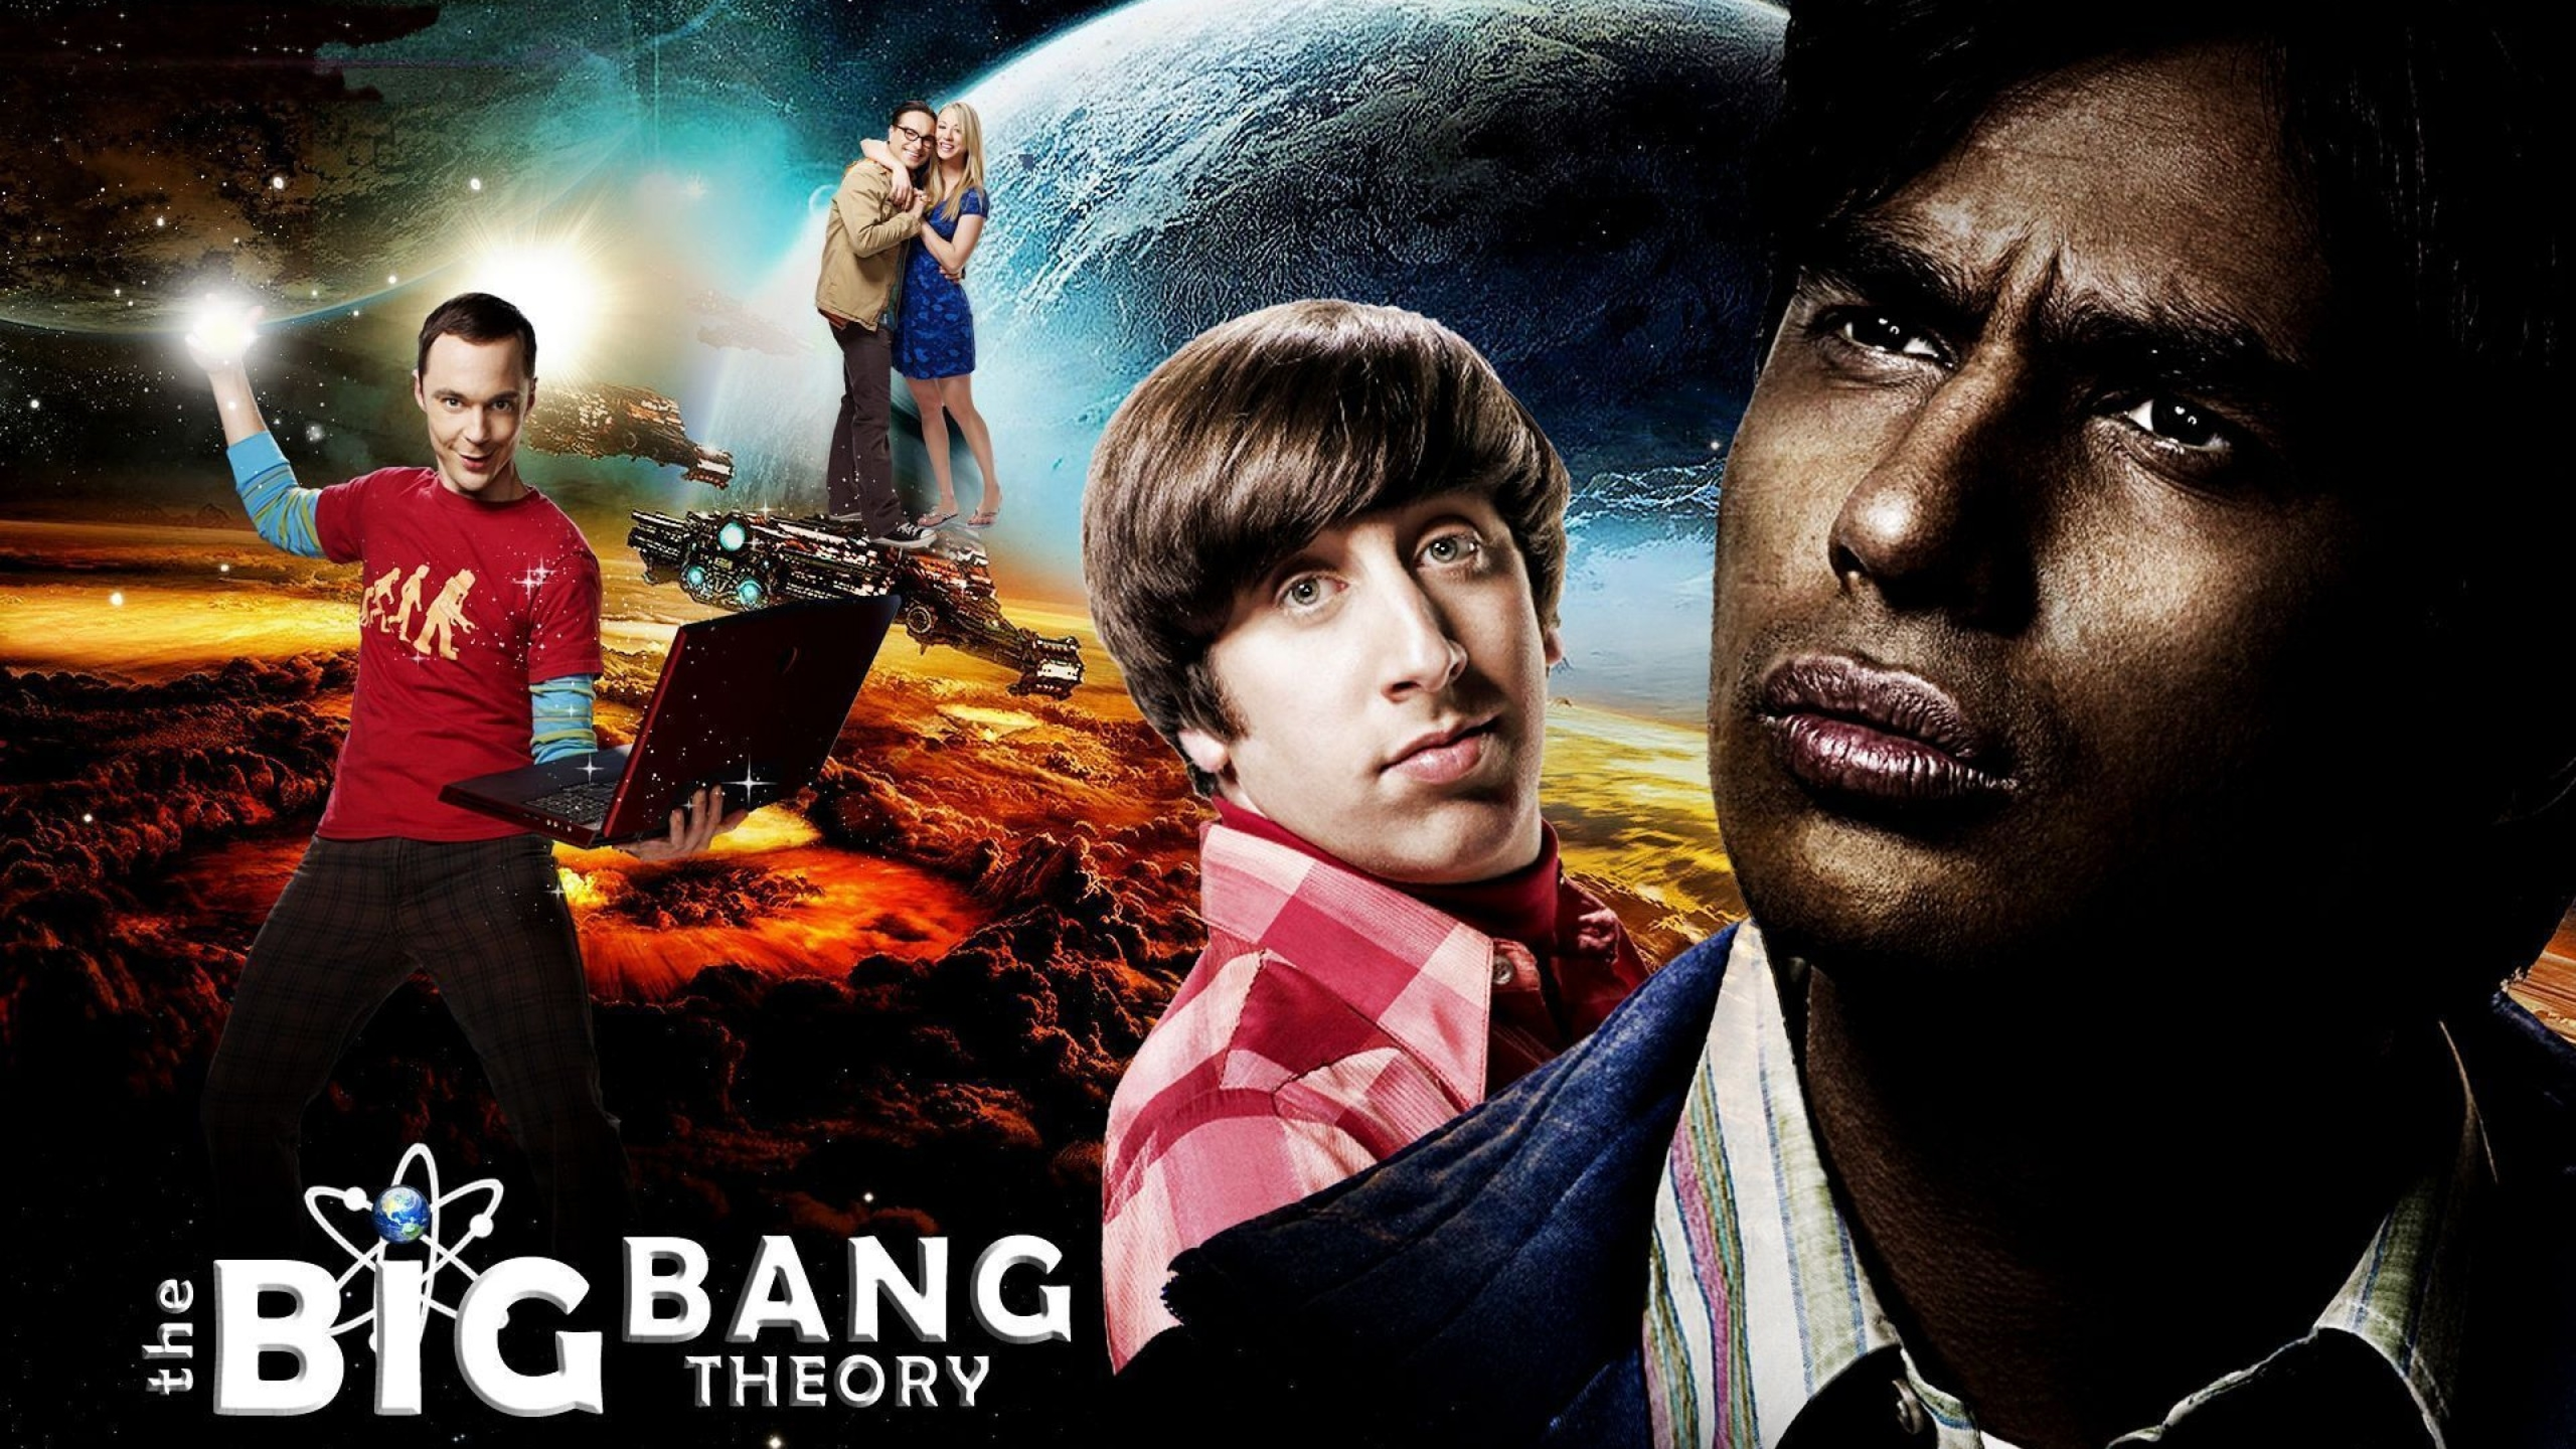 7680x4320 Big Bang Theory Actors Sheldon 8k Wallpaper Hd Tv